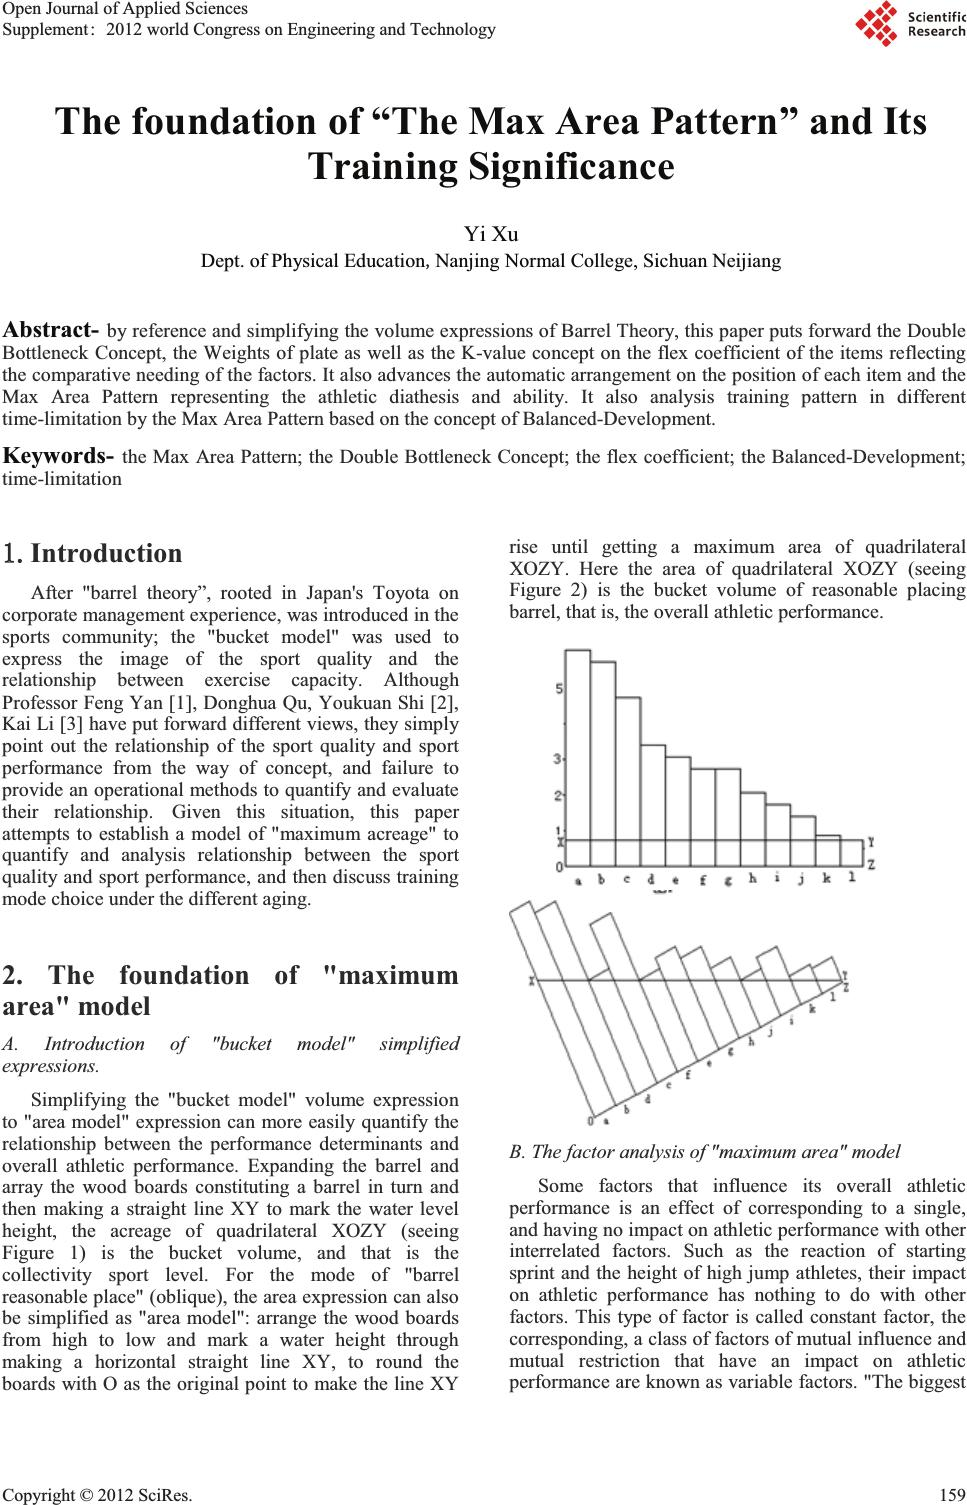 foundations of education volume 1 pdf free